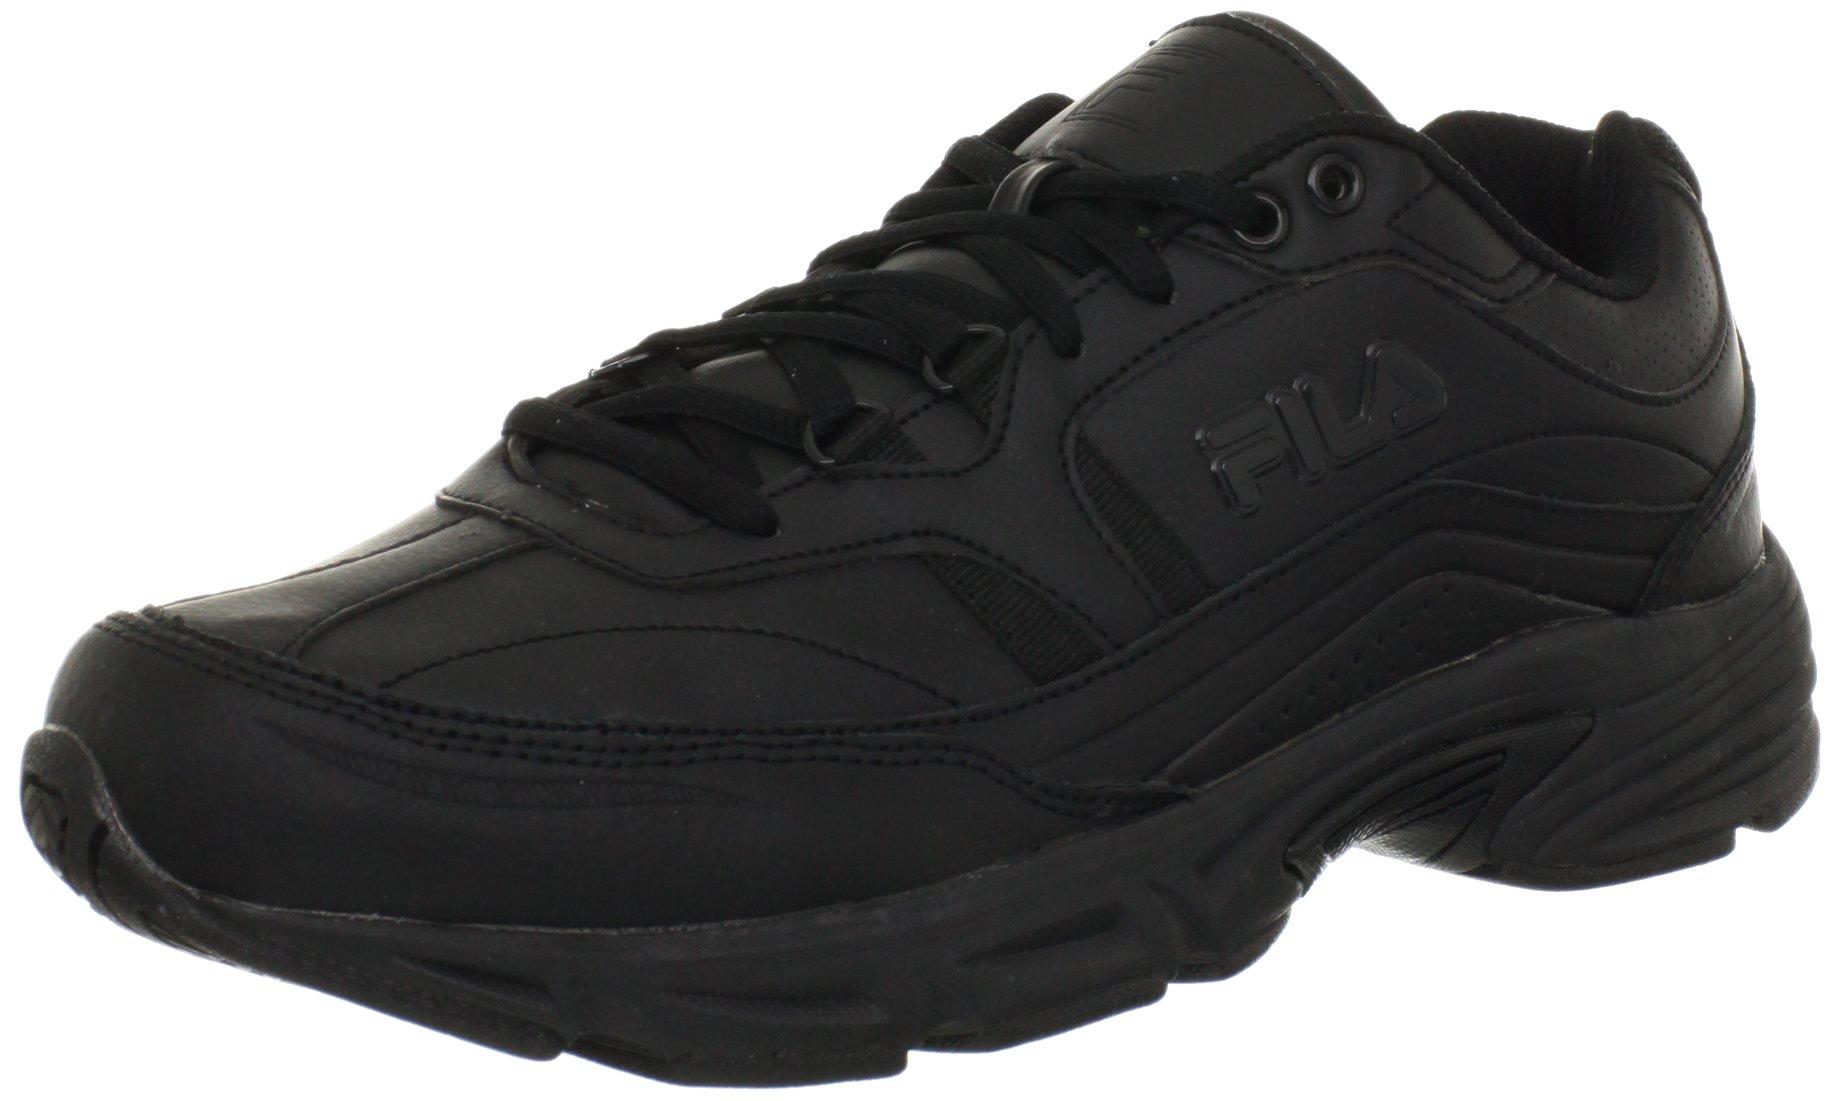 Fila Men's Memory Workshift Cross-Training Shoe,Black/Black/Black,10 4E US by Fila